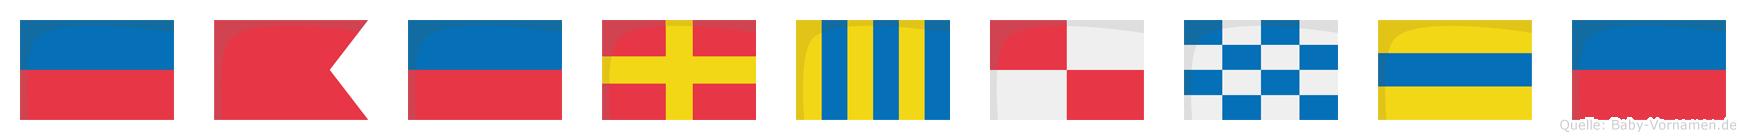 Ebergunde im Flaggenalphabet